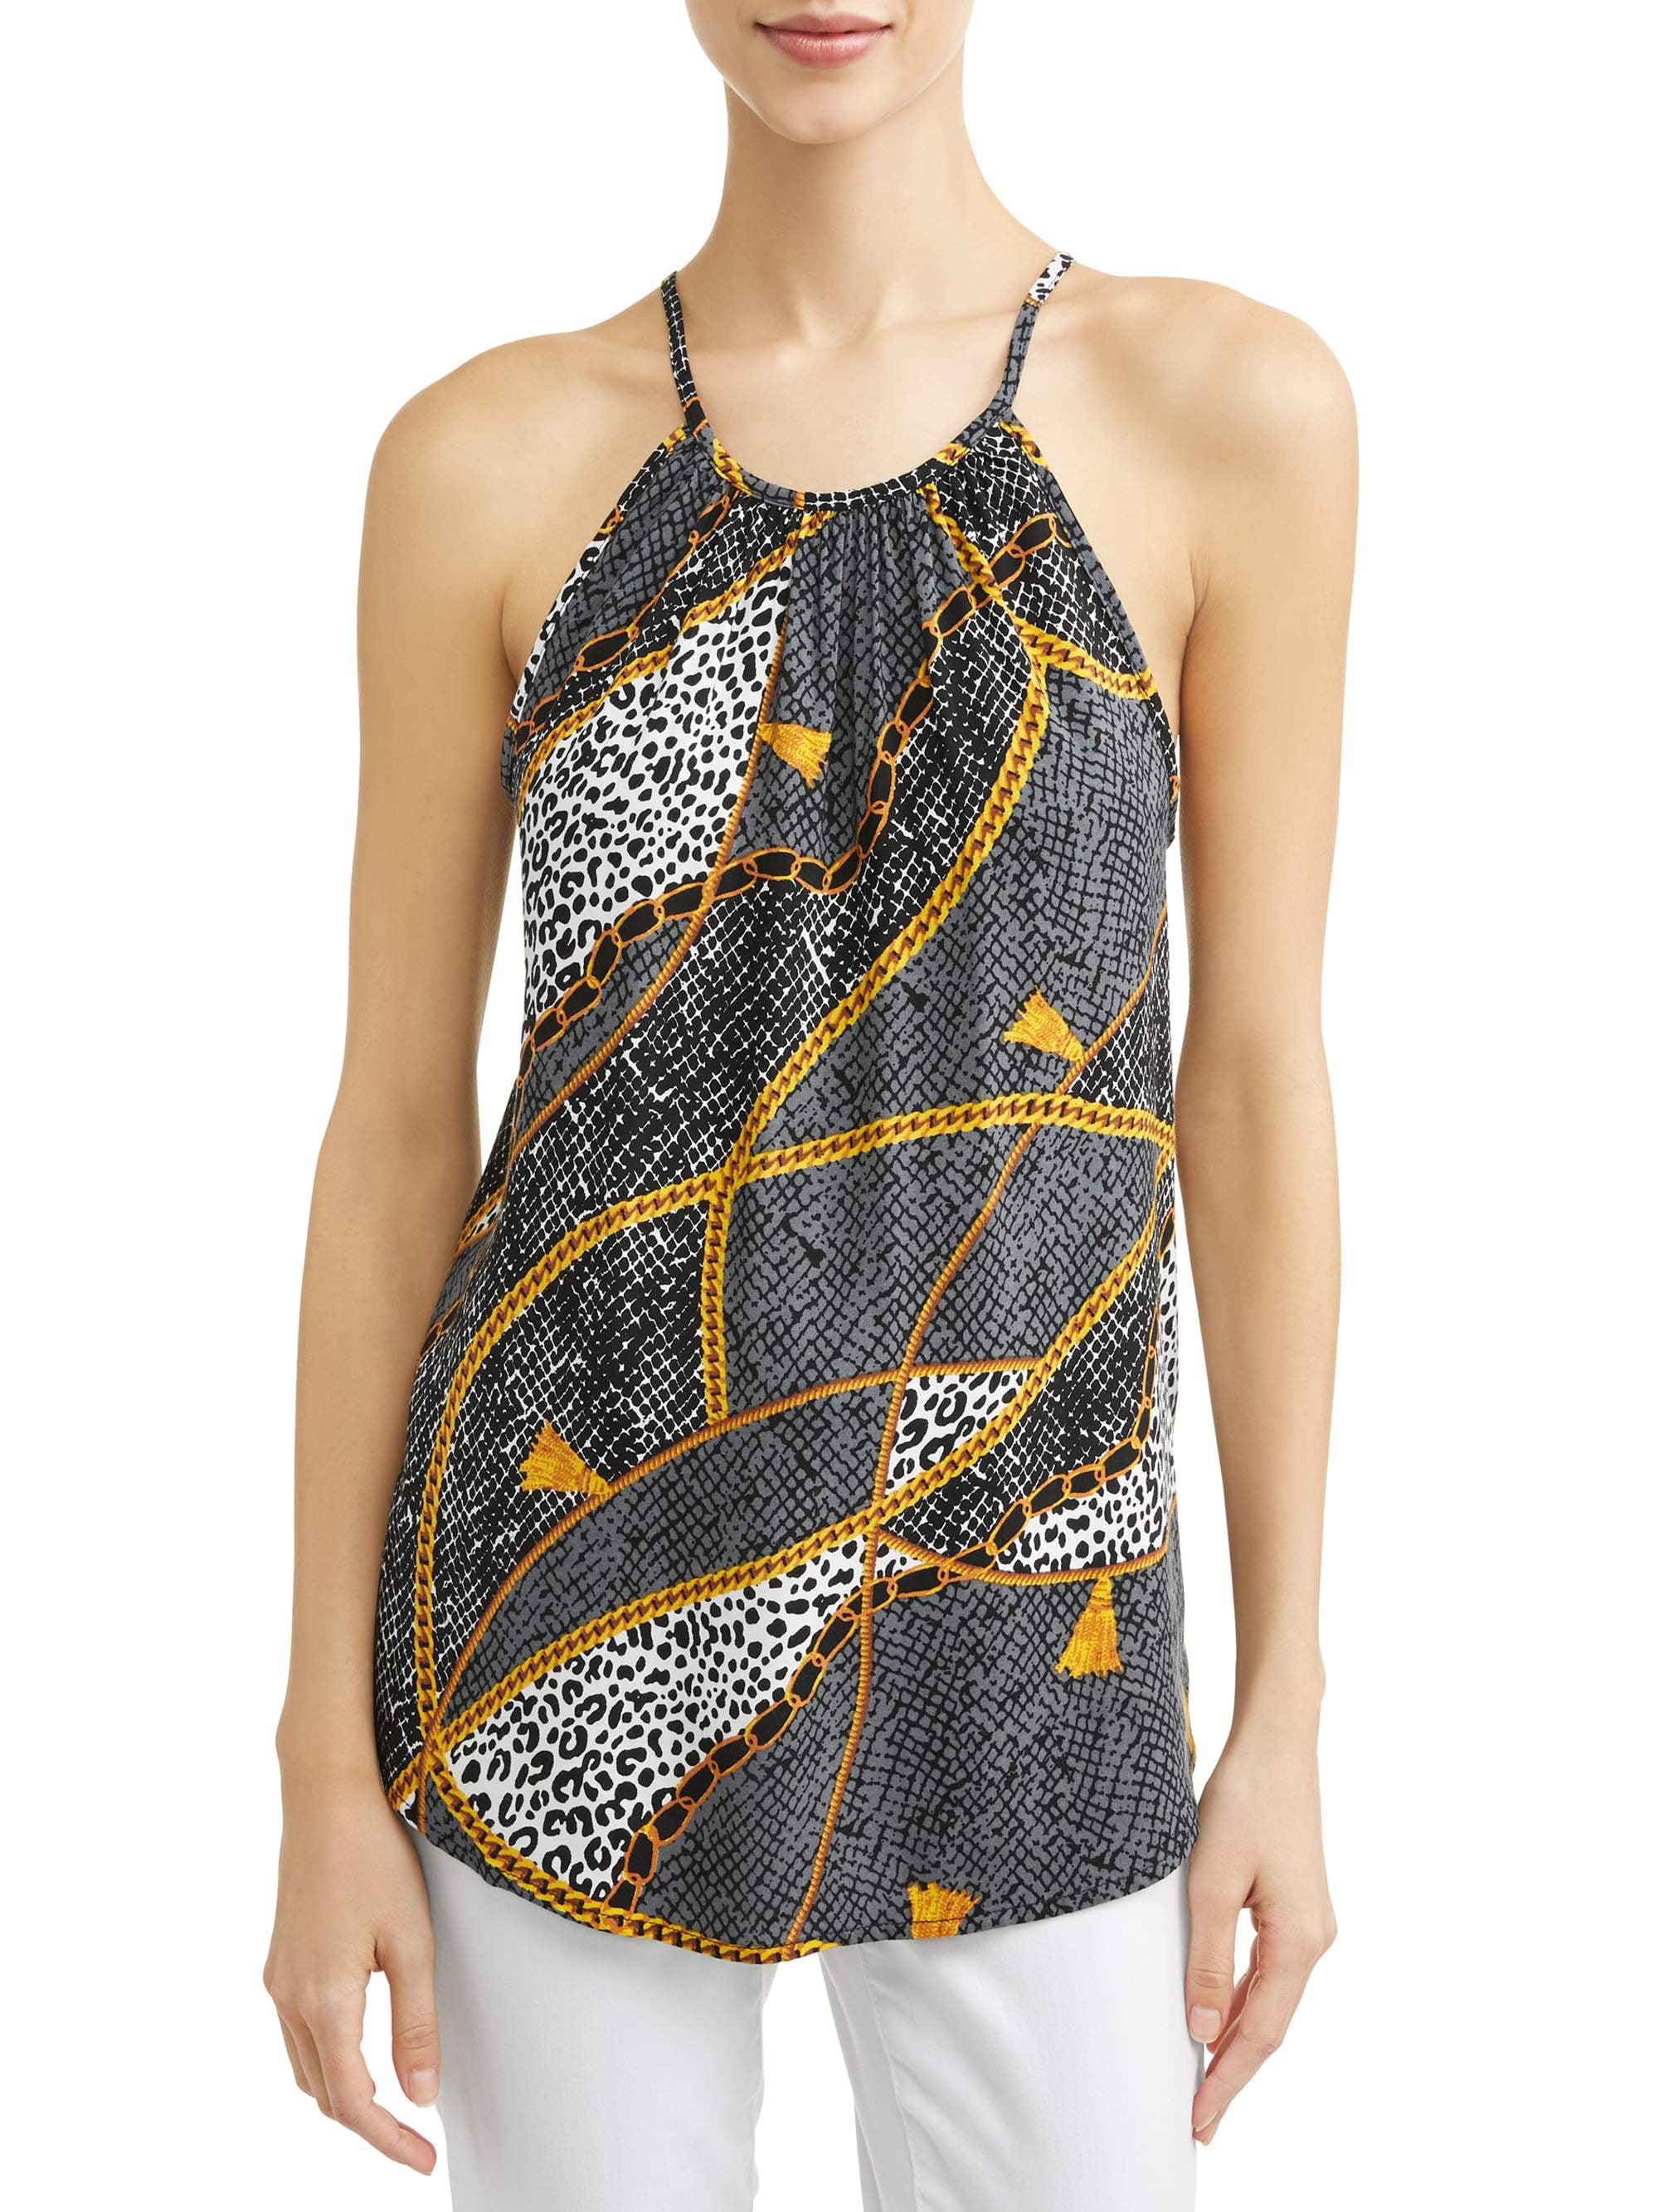 Women's Printed Sleeveless Blouse